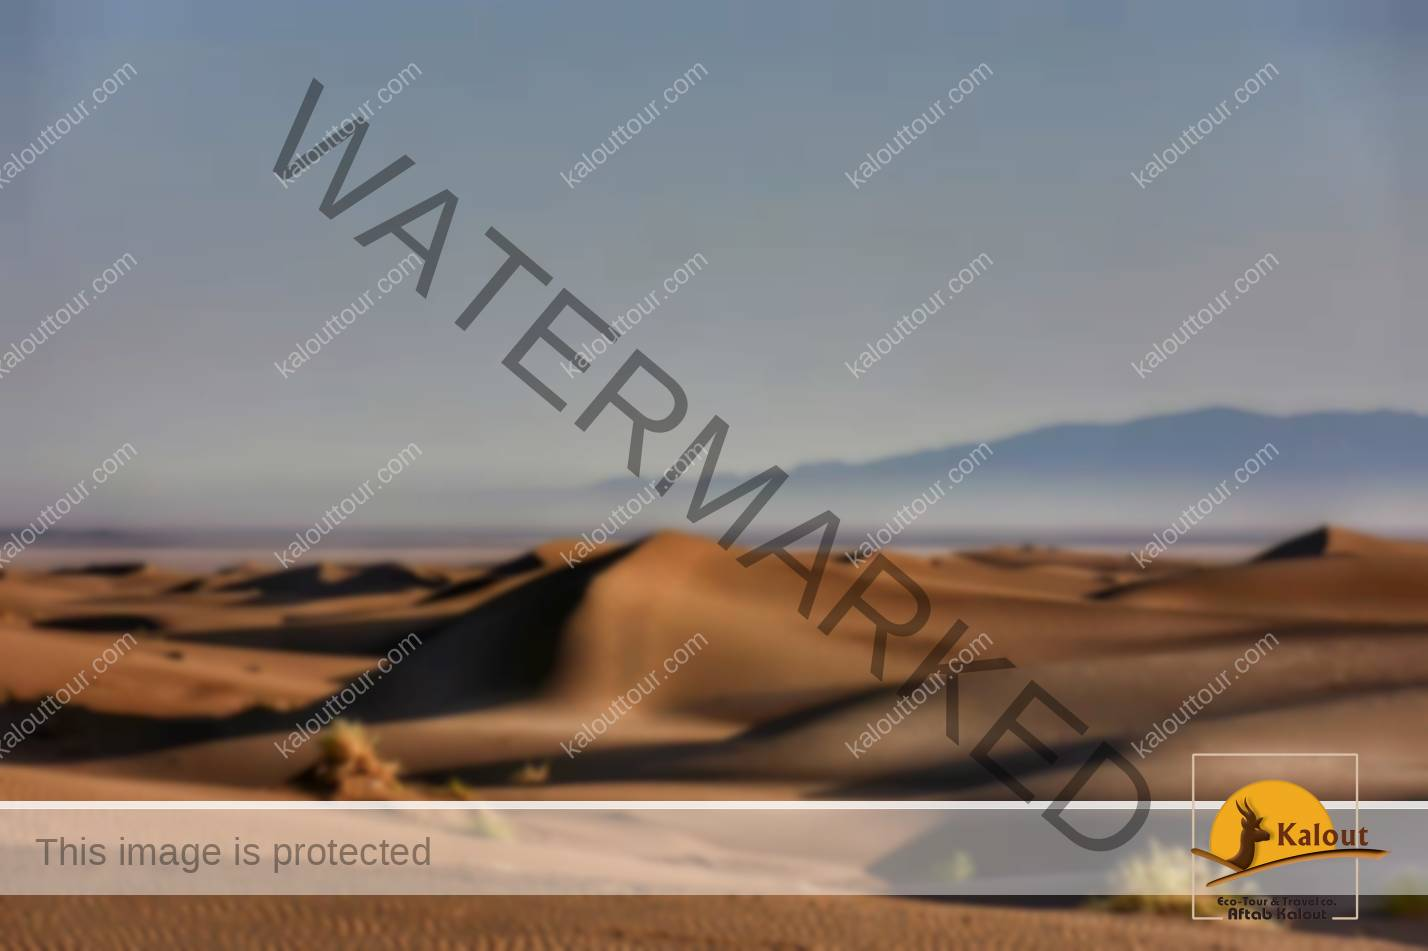 Dasht-e Kavir, sandy dunes